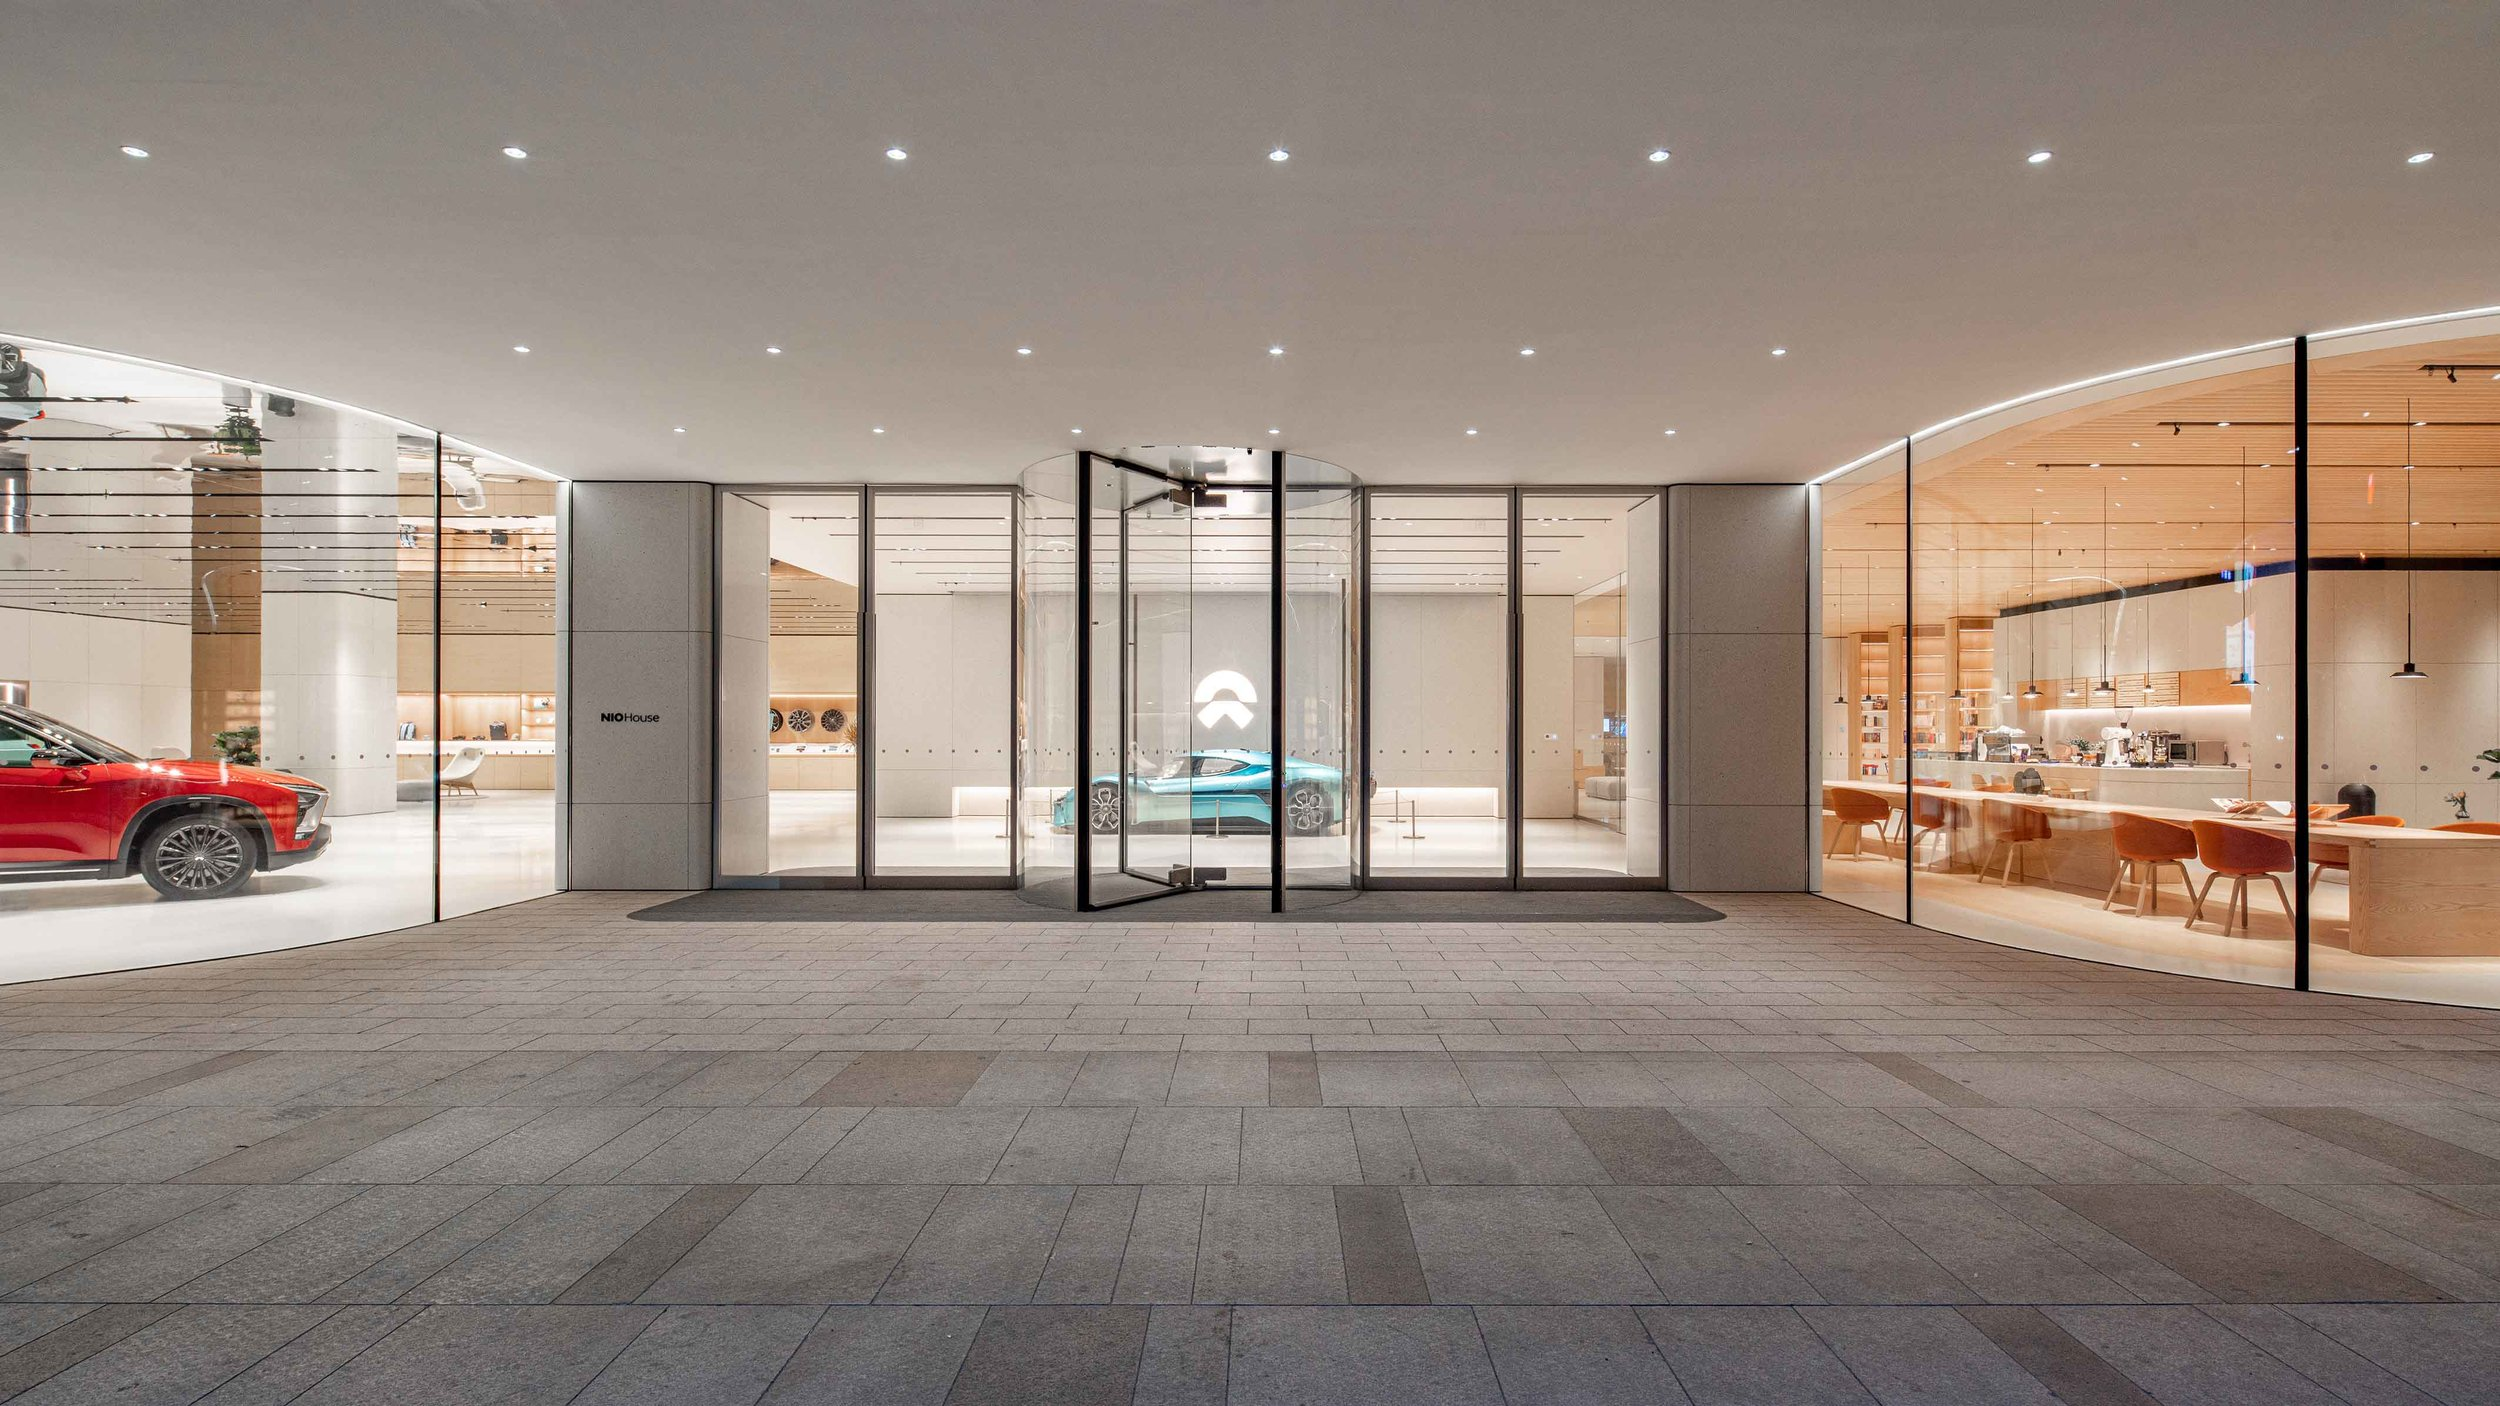 009 RAAMS Architecture Studio - NIO House Tianjin - China-Low.jpg